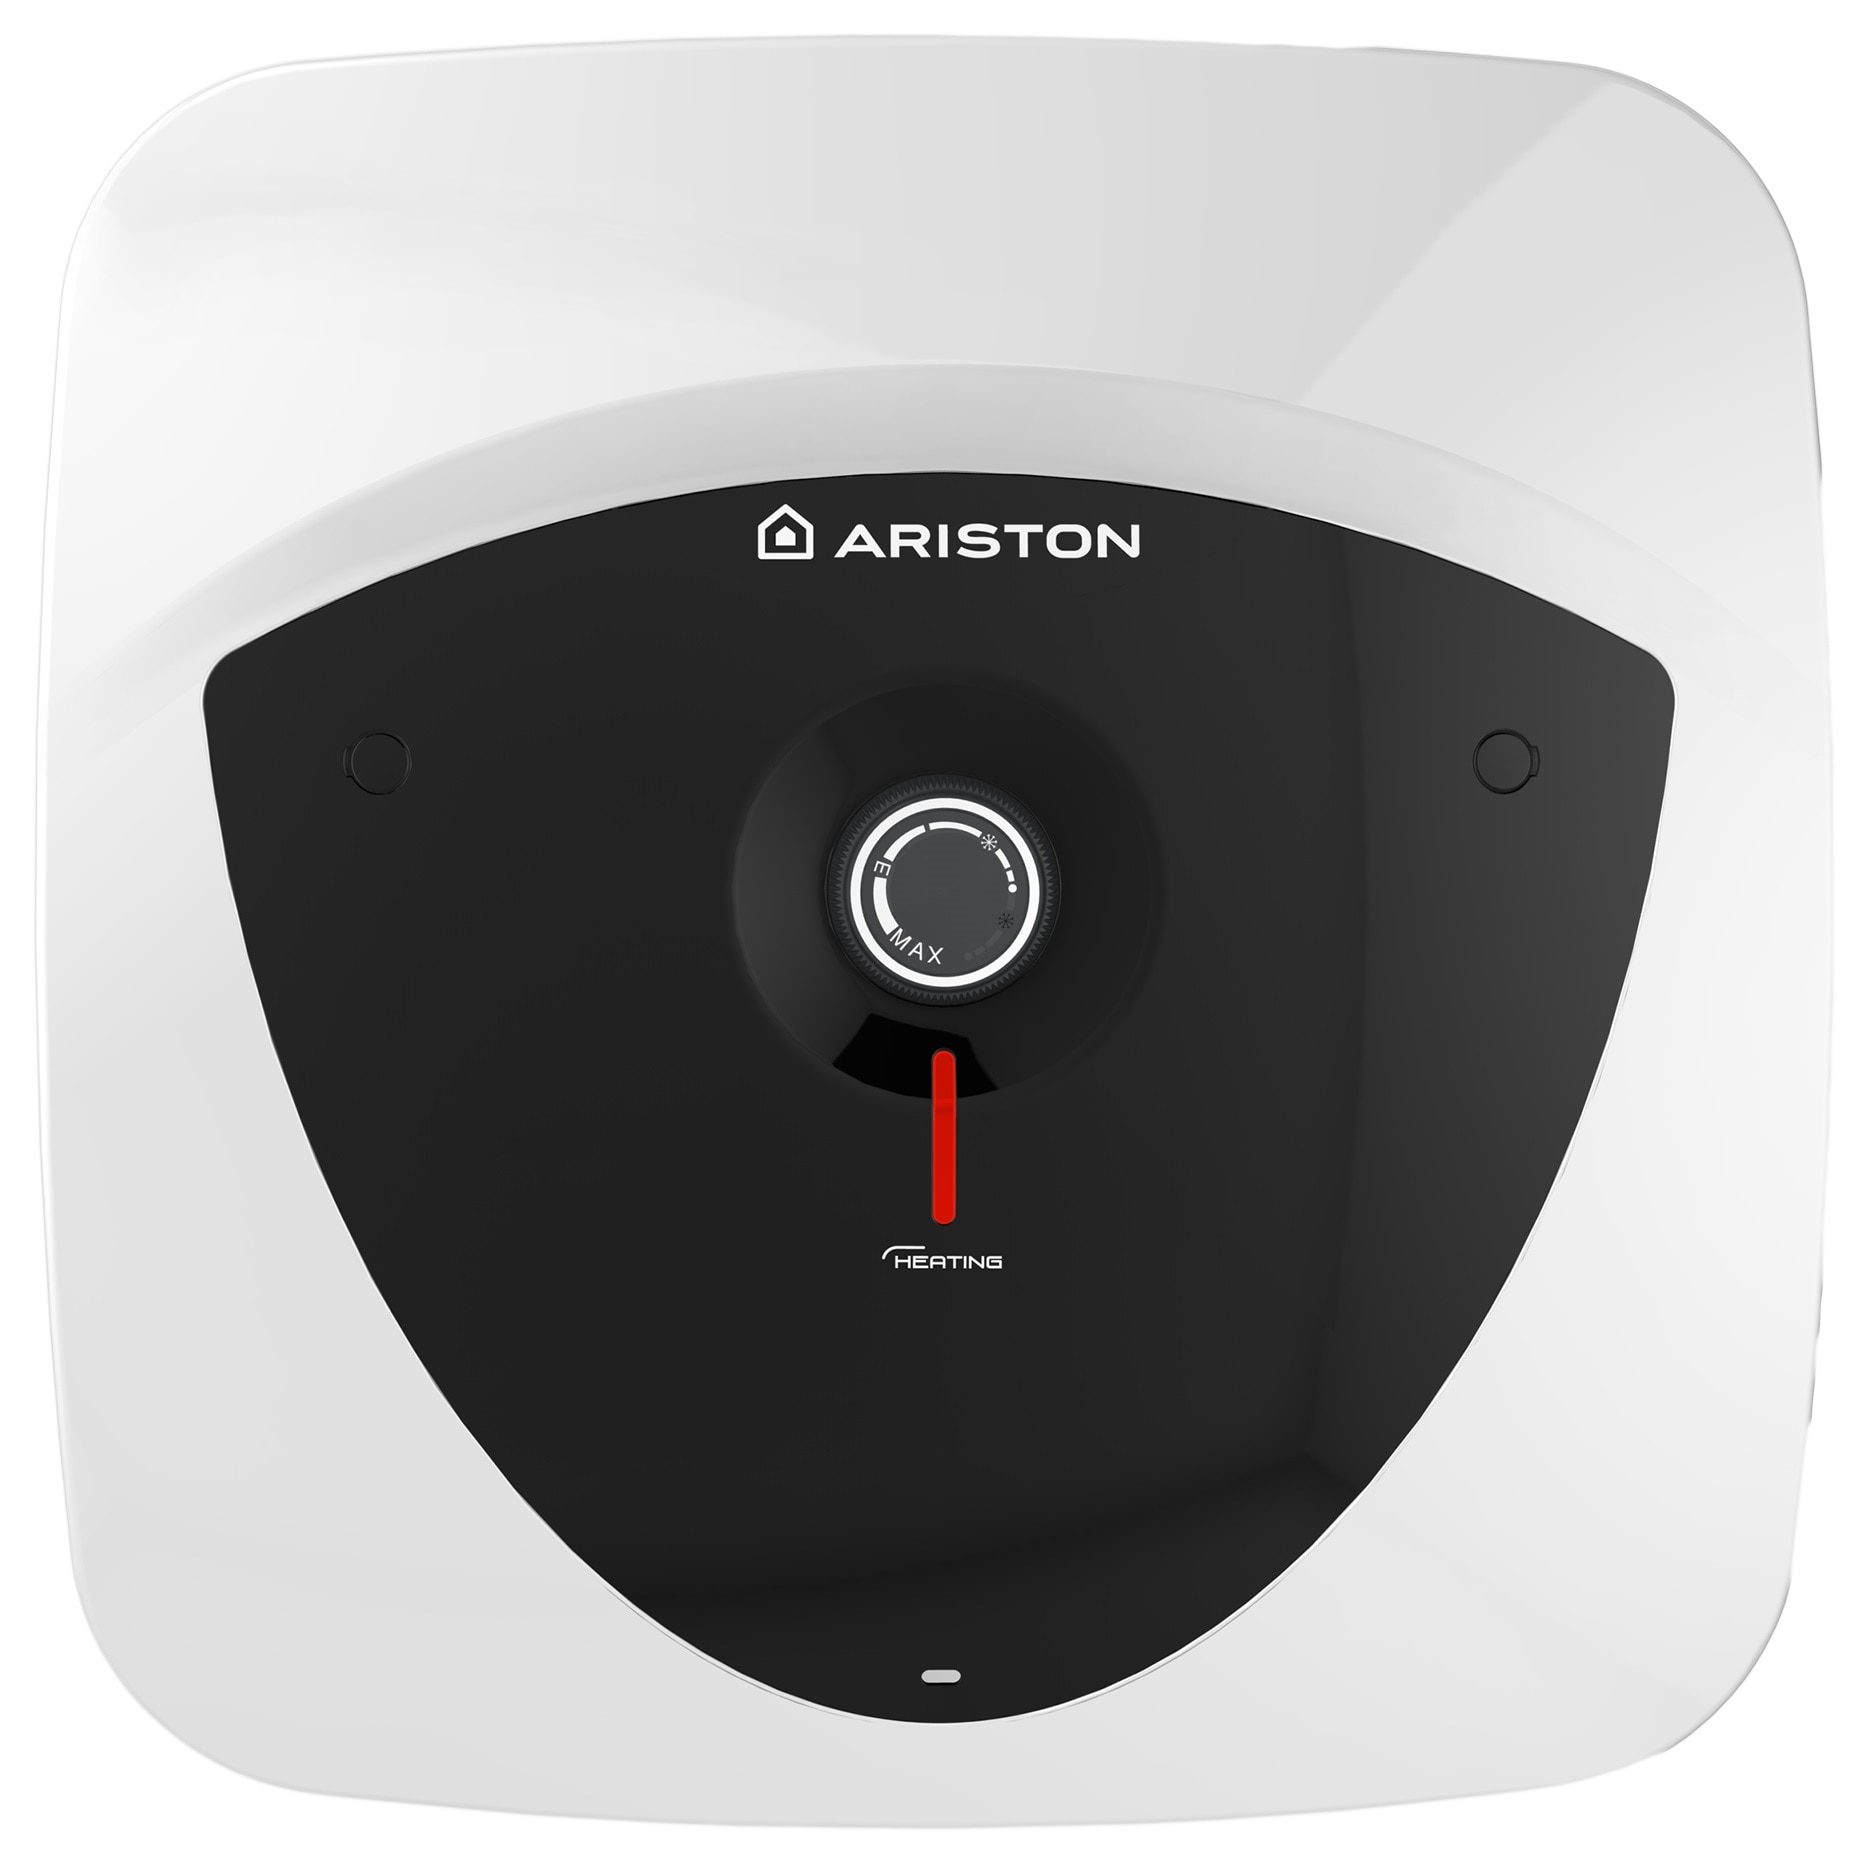 Fotografie Boiler electric Ariston Andris LUX 15 U EU, 15 l, 1200 W, Led iluminat, Protectie electrica IPX5, Montare sub chiuveta, Reglaj extern de temperatura